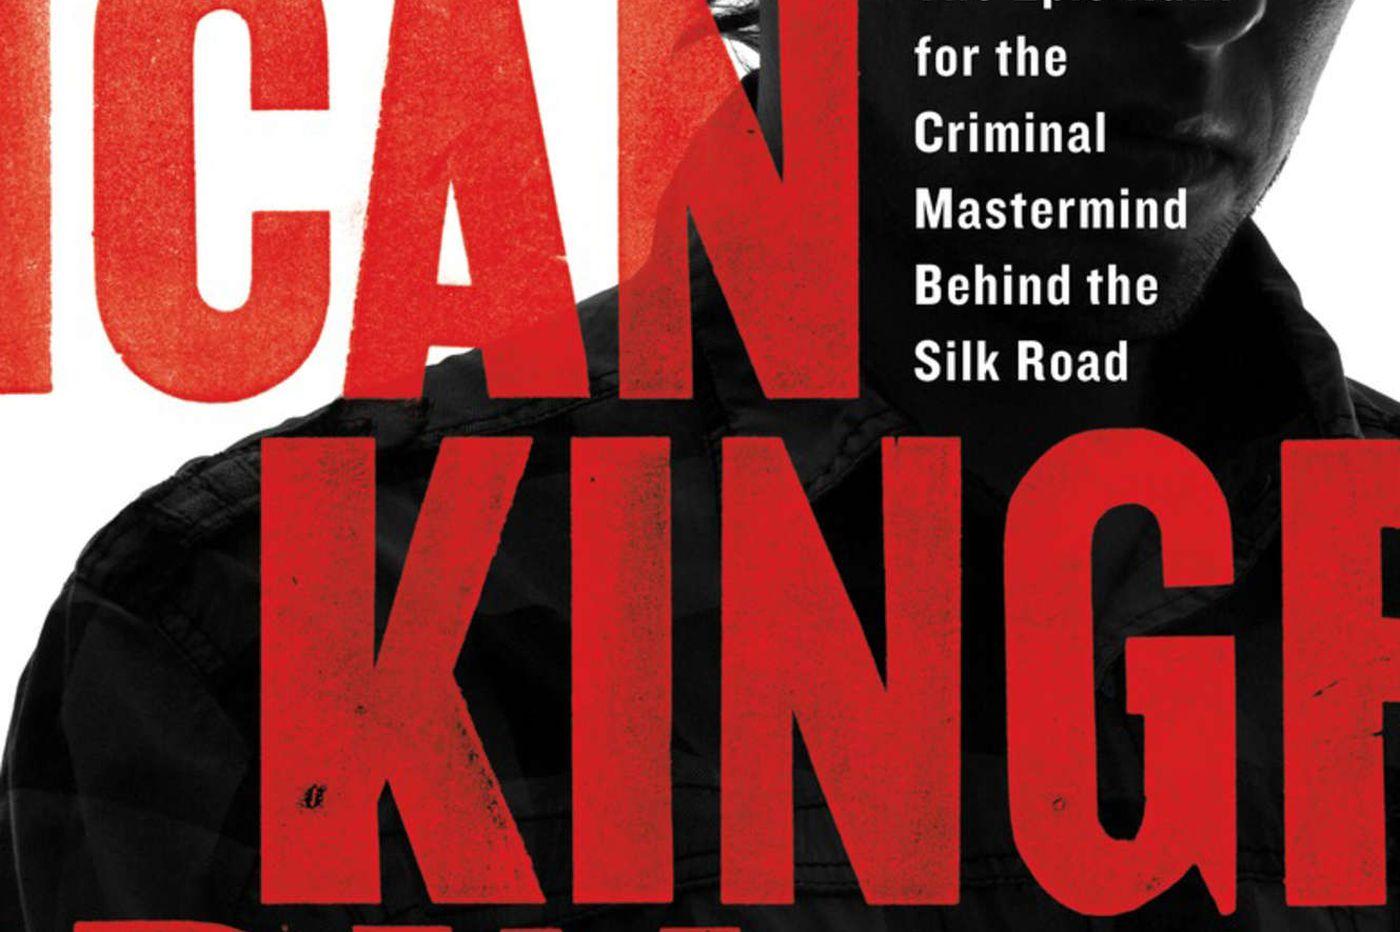 Nick Bilton's 'American Kingpin': The first great Internet manhunt